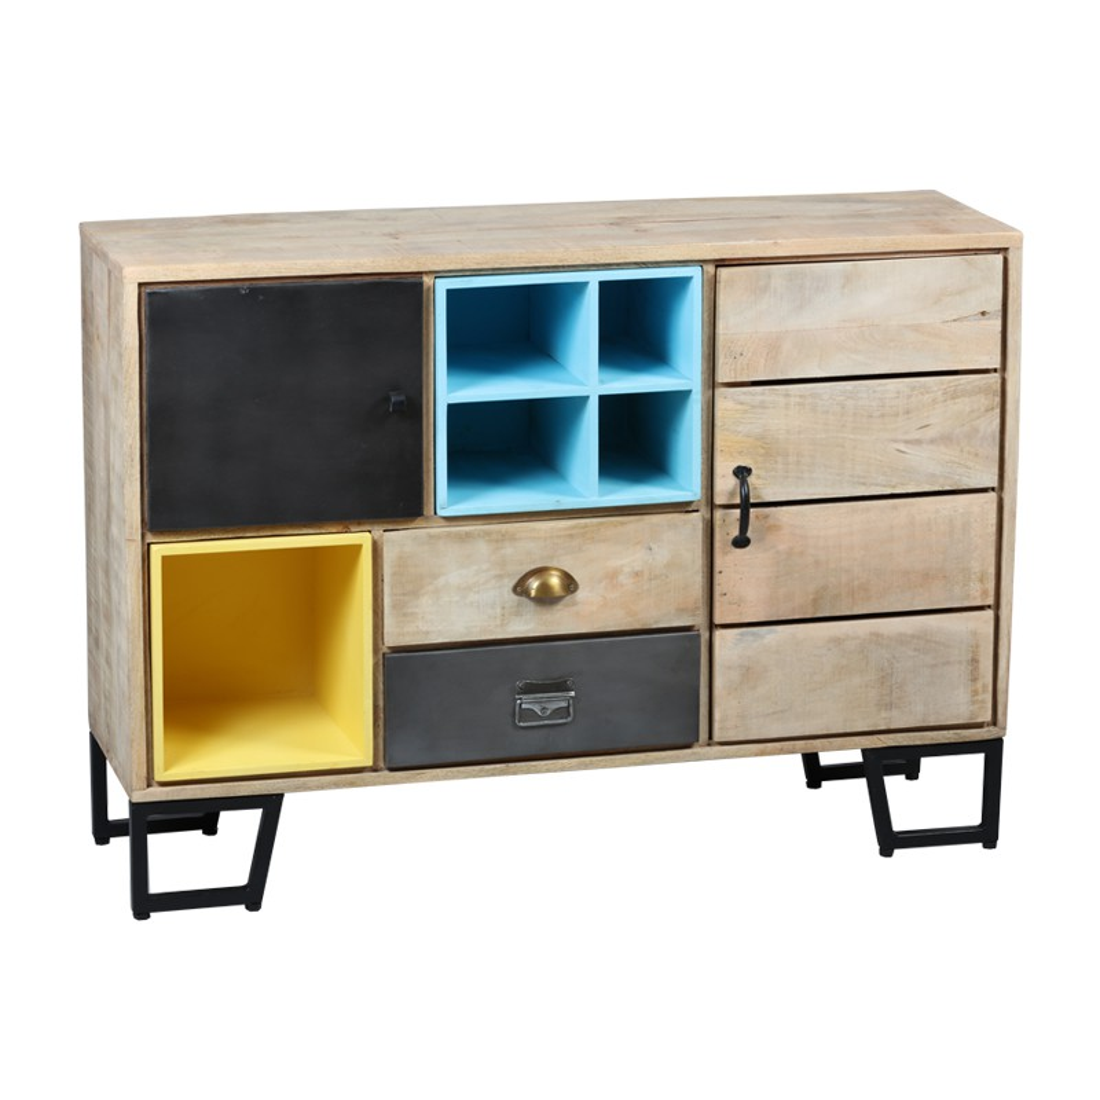 meuble d 39 entr e bois m tal supply univers petits meubles. Black Bedroom Furniture Sets. Home Design Ideas